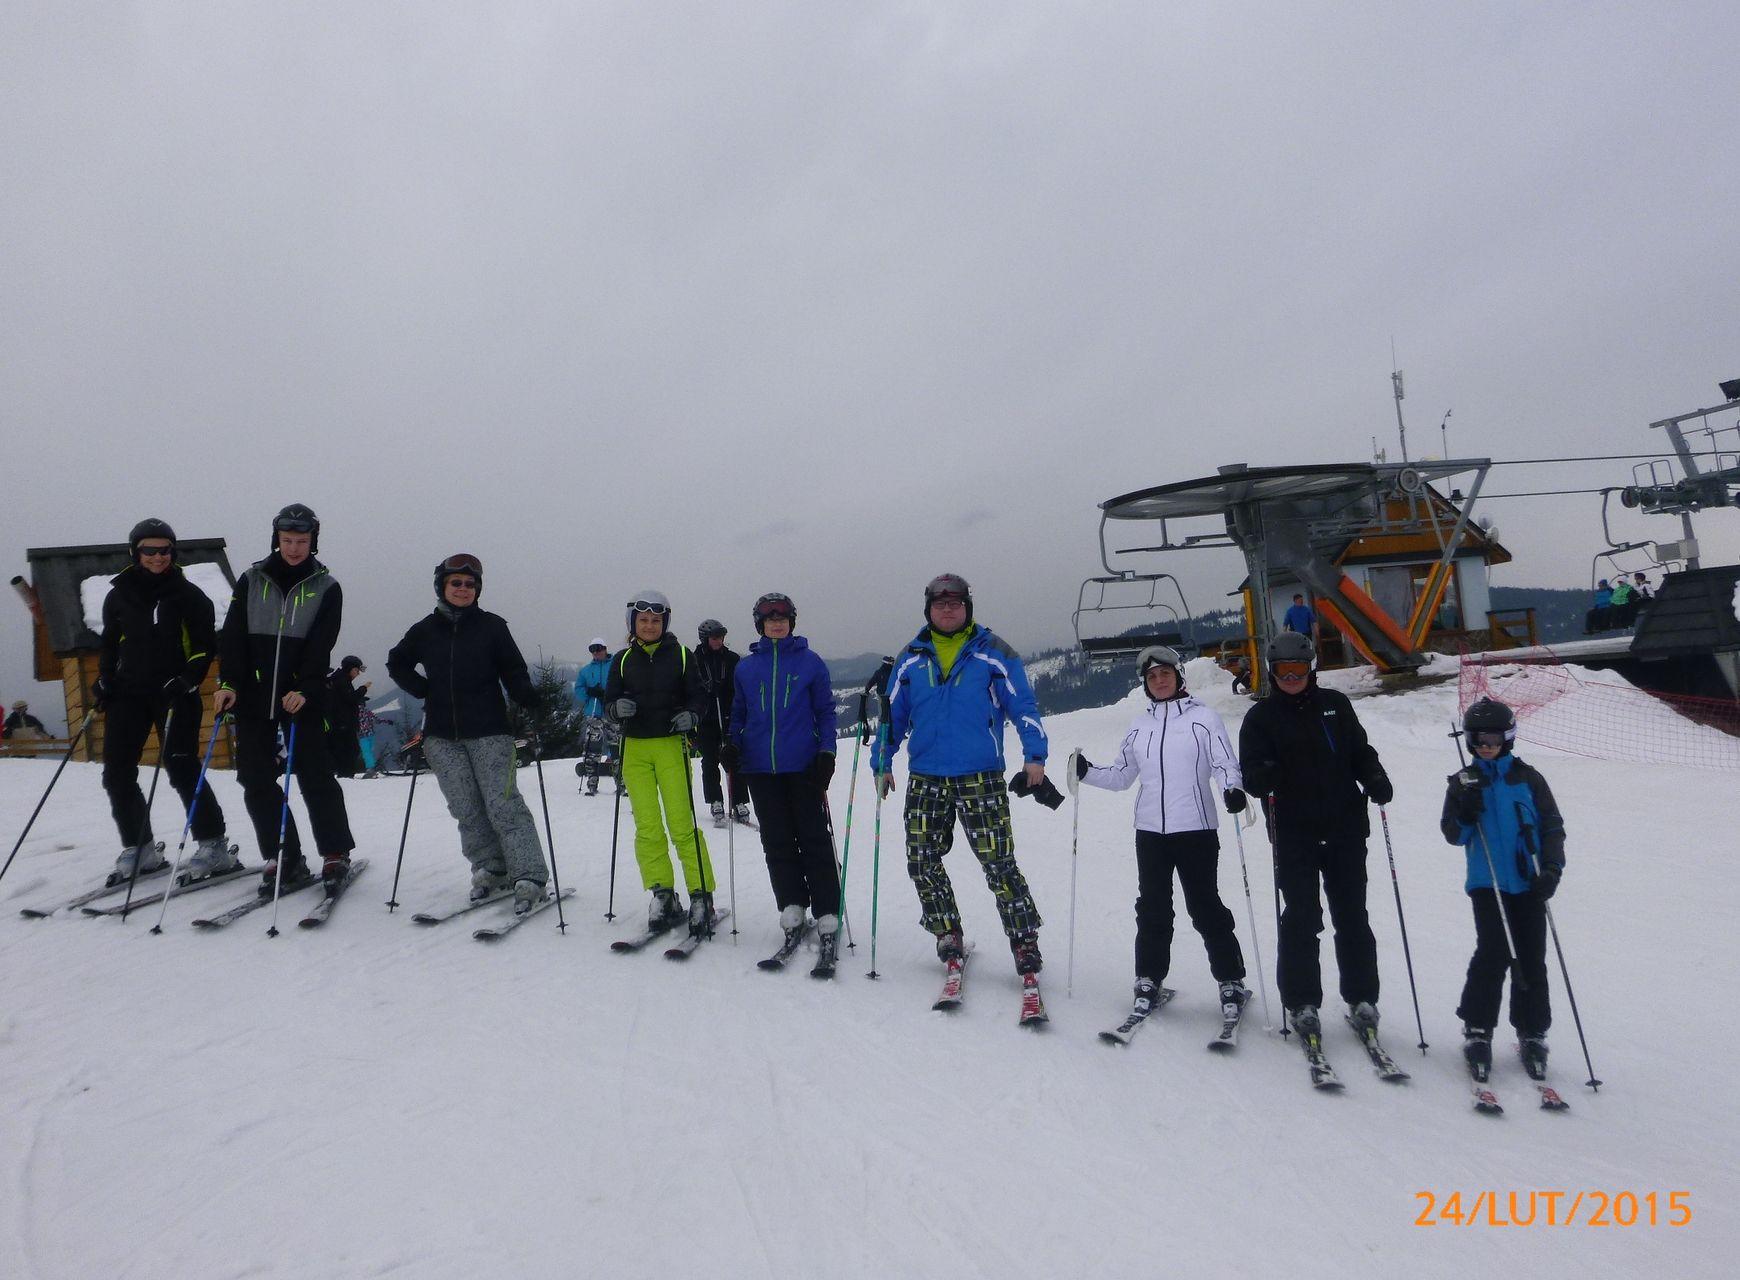 CarTourist_narty-snowboard_2015-foto-29